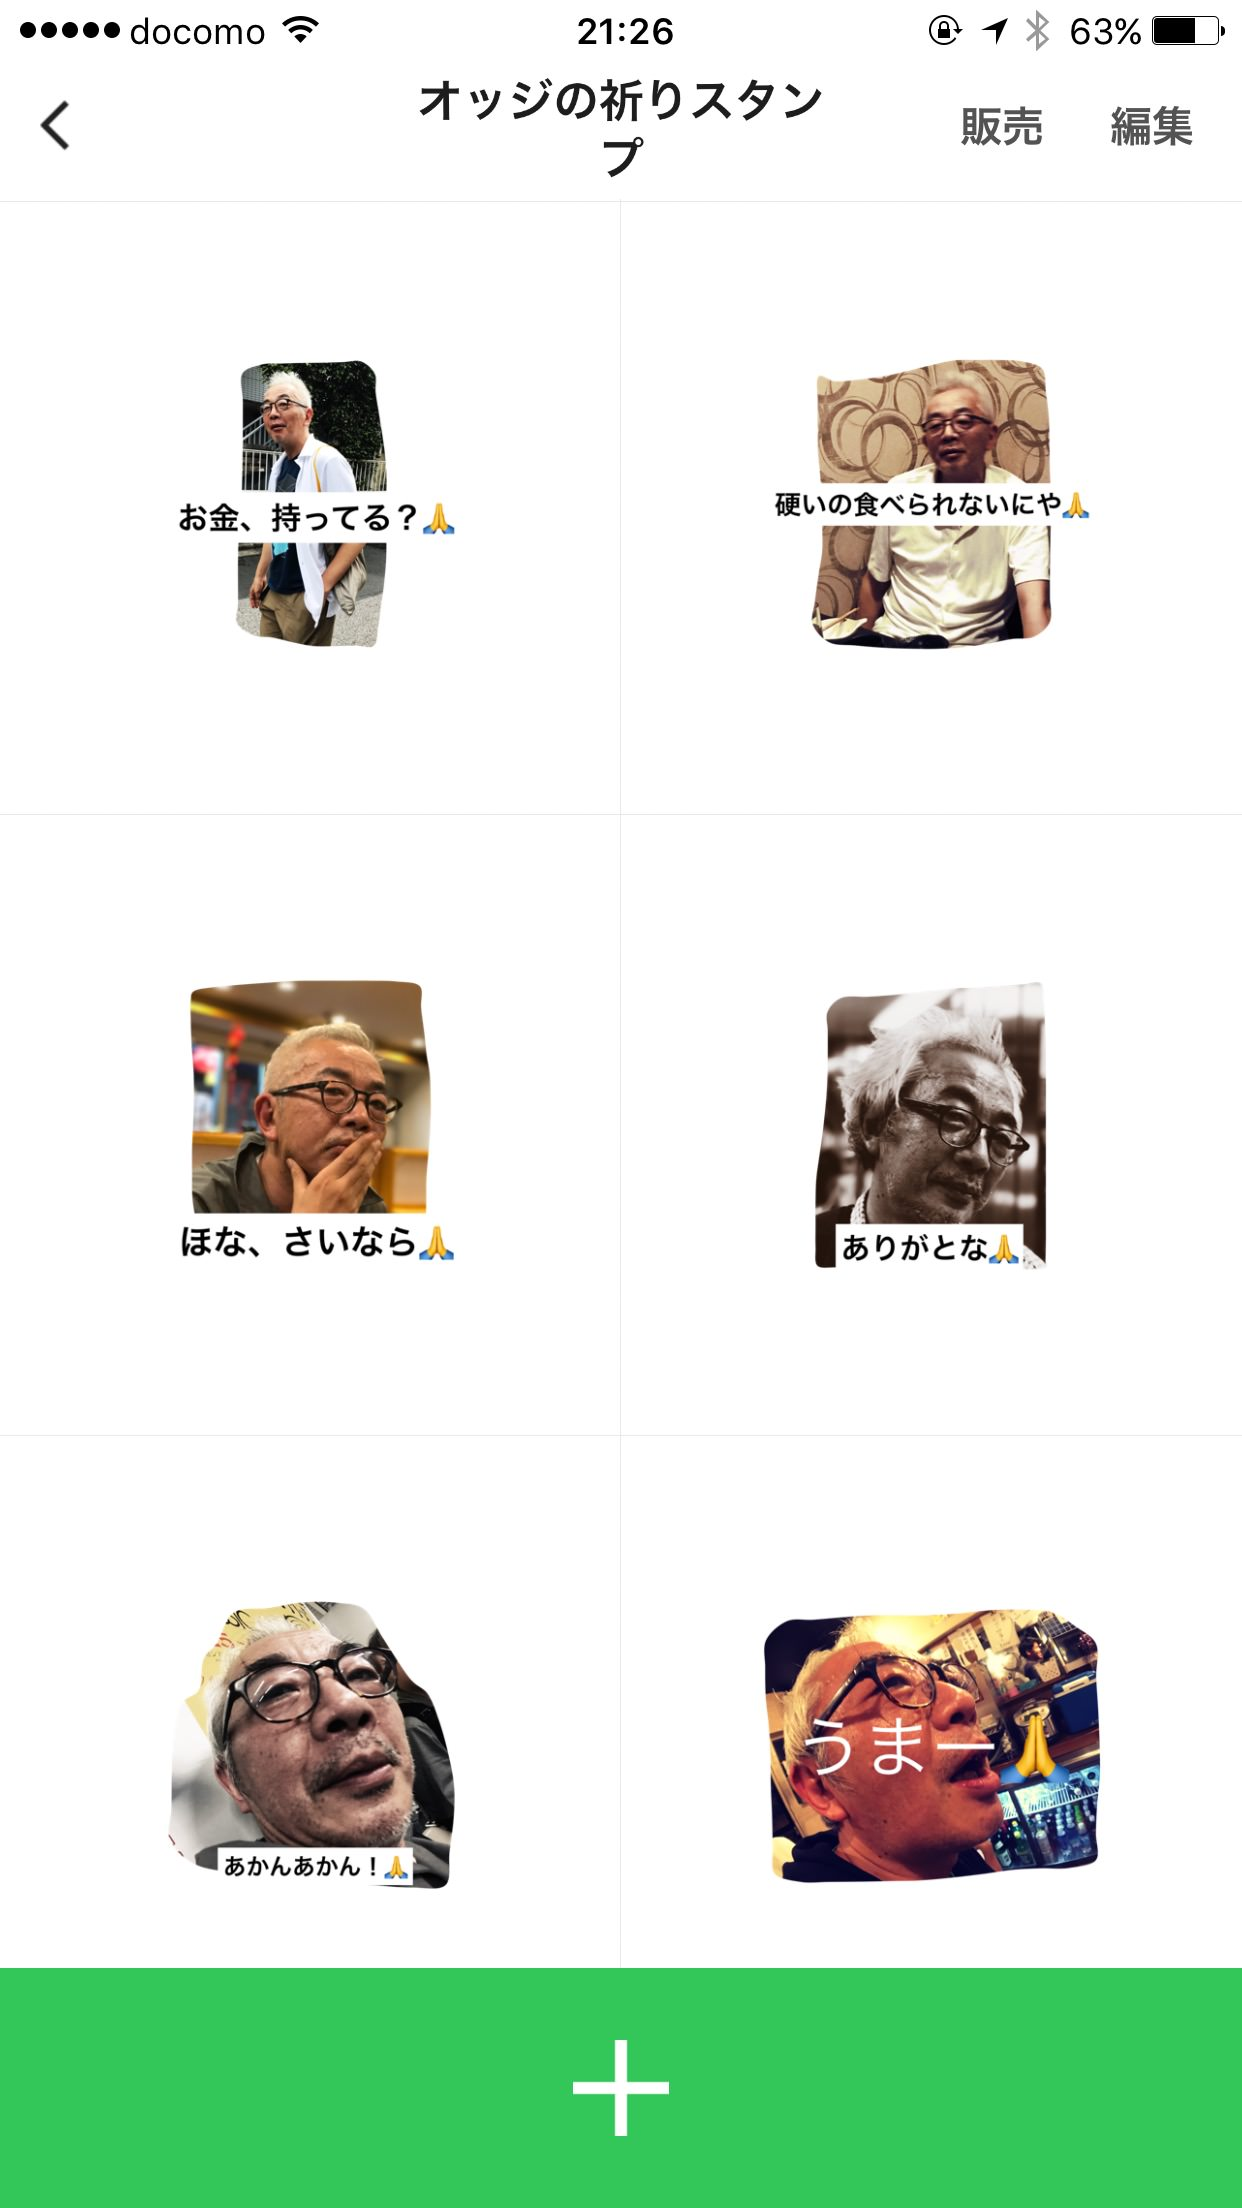 Line creators stamp 5341